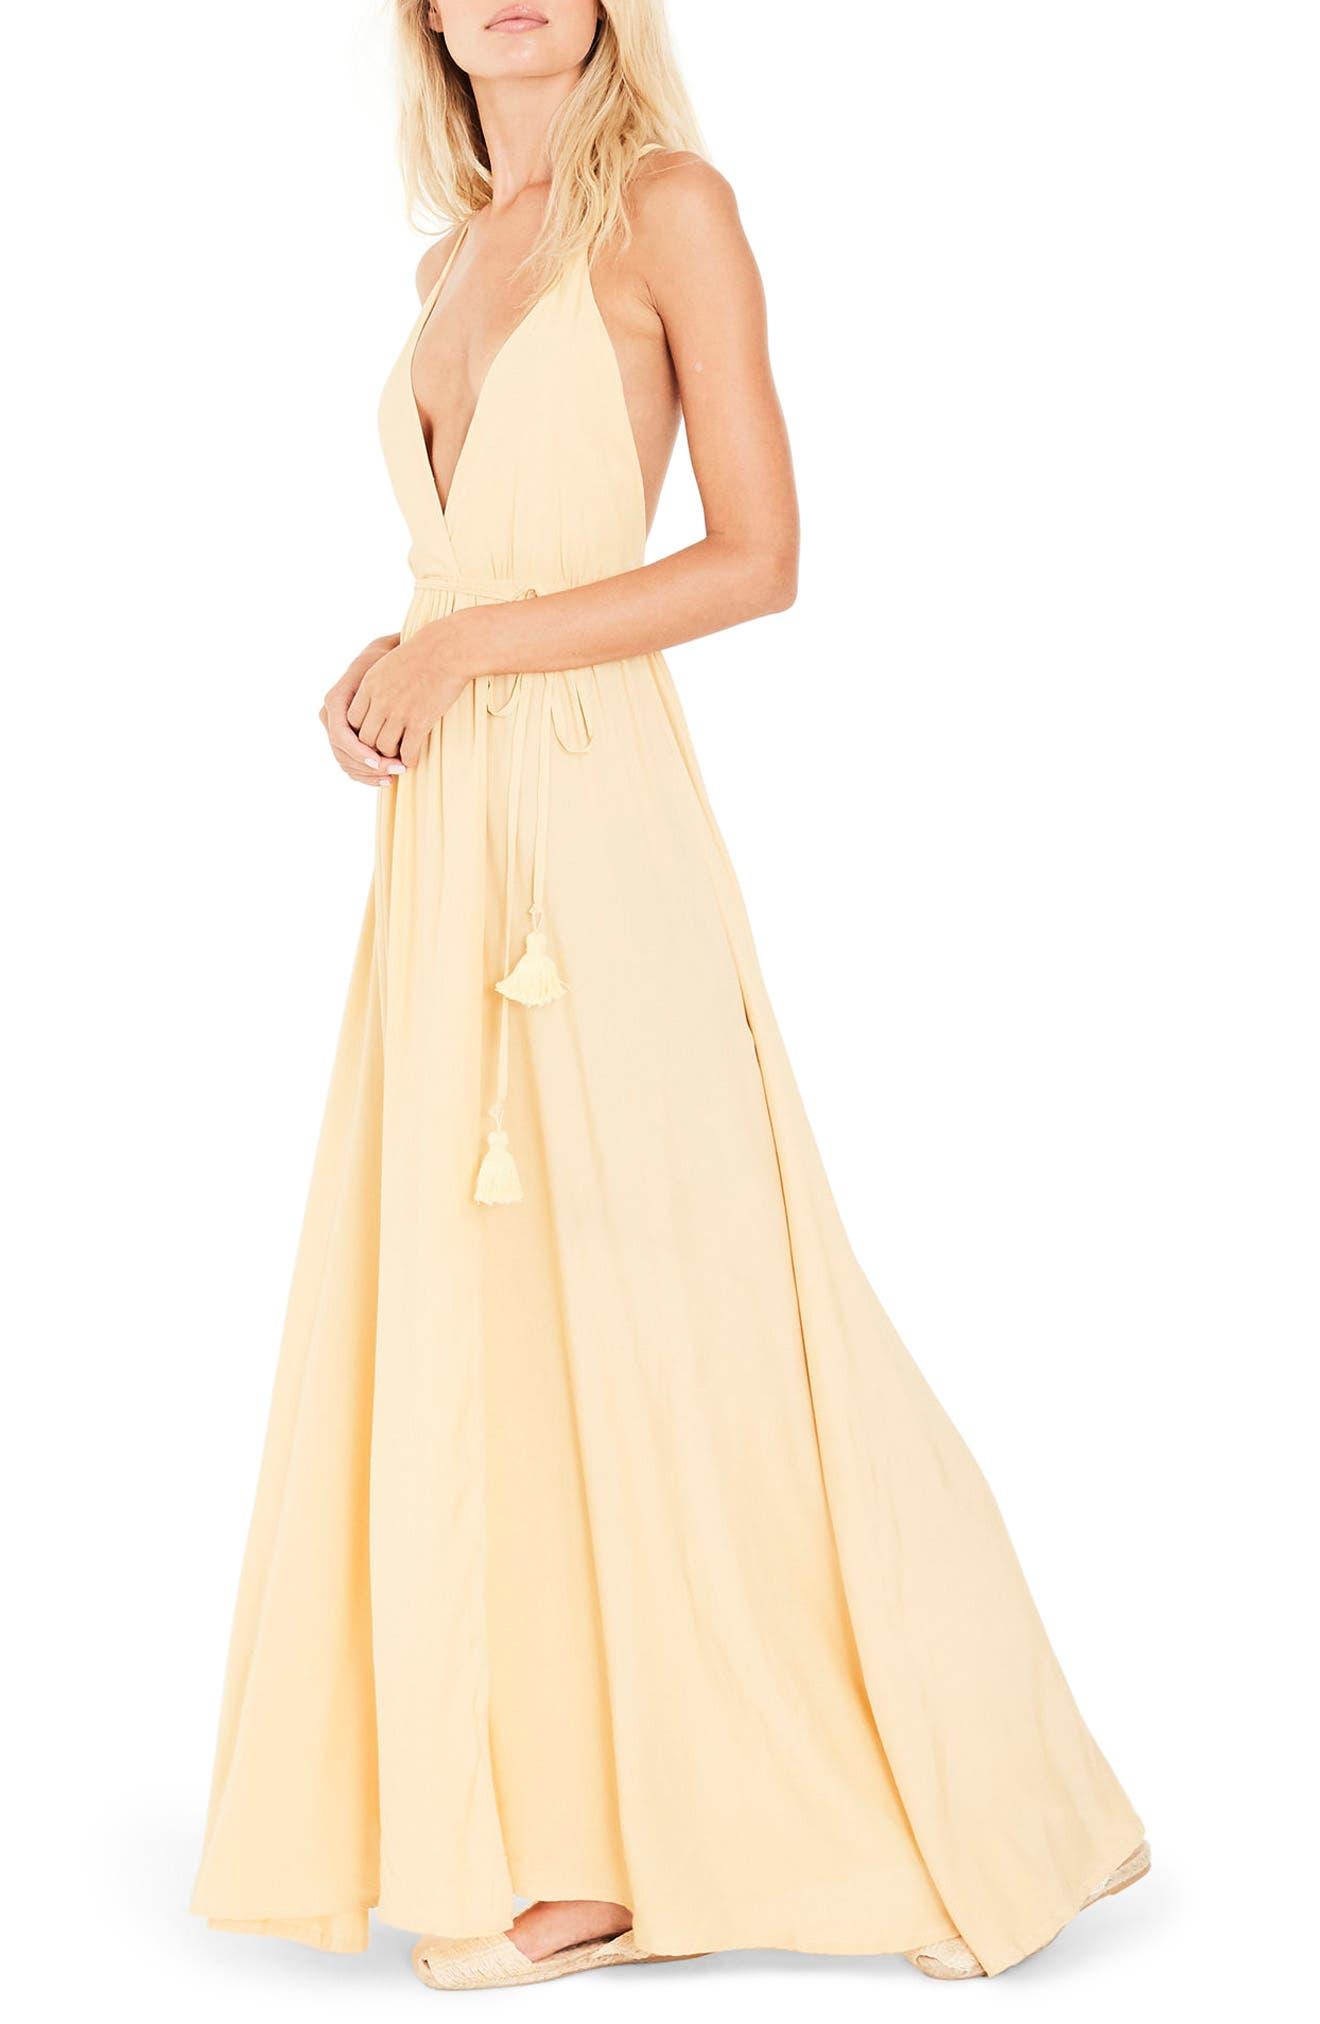 Santa Rose Strappy Maxi Dress,                             Alternate thumbnail 3, color,                             700